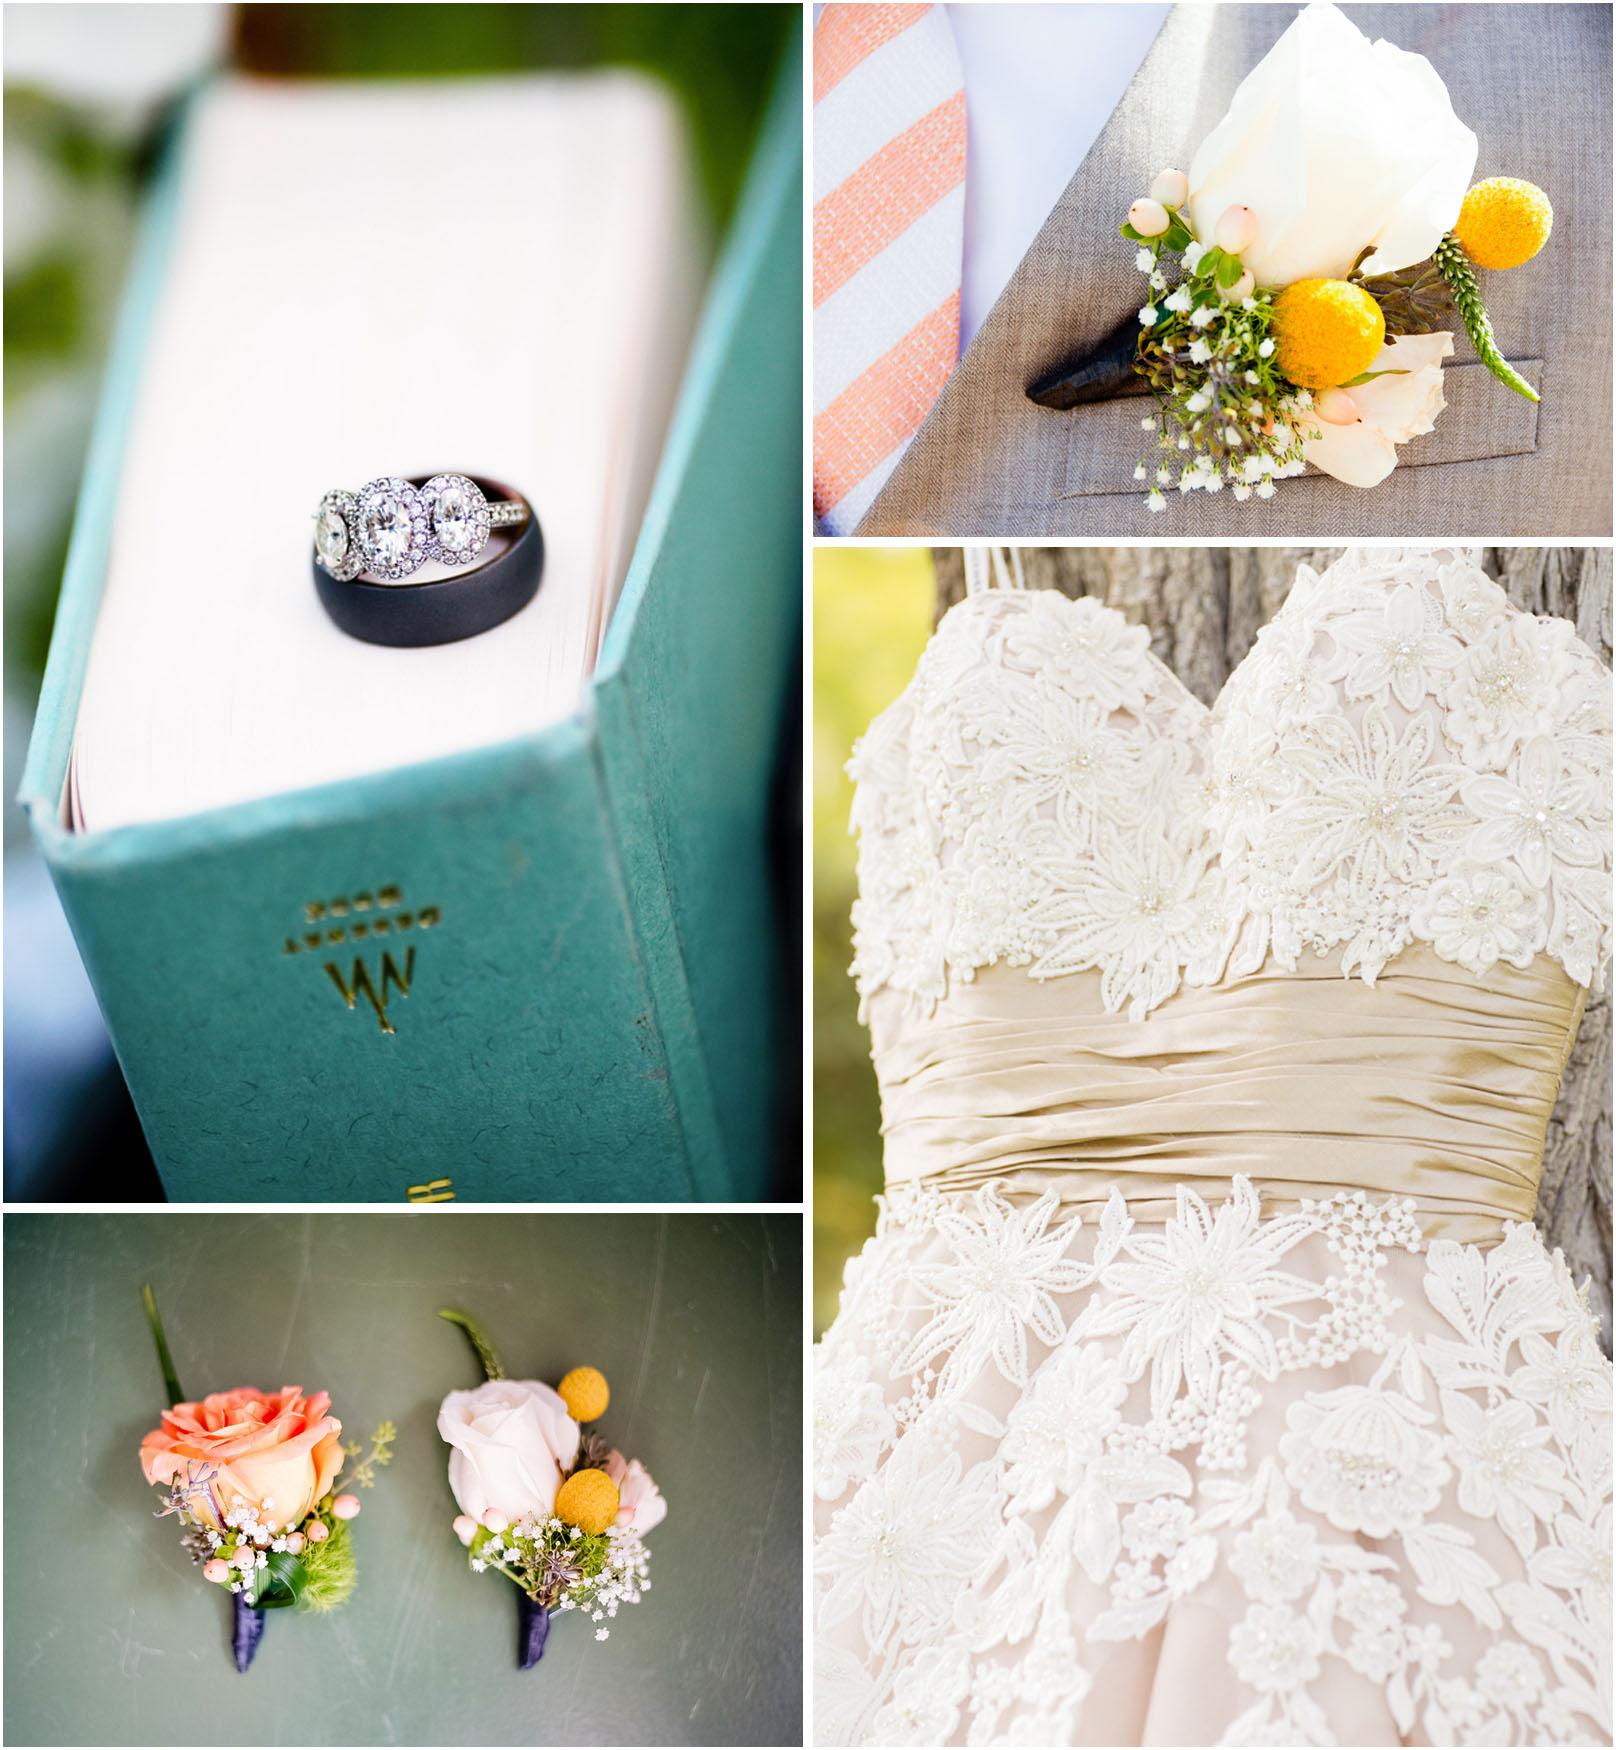 vegas wedding dresses styles vegas wedding dresses Vegas Style Wedding Dresses Dress Ideas